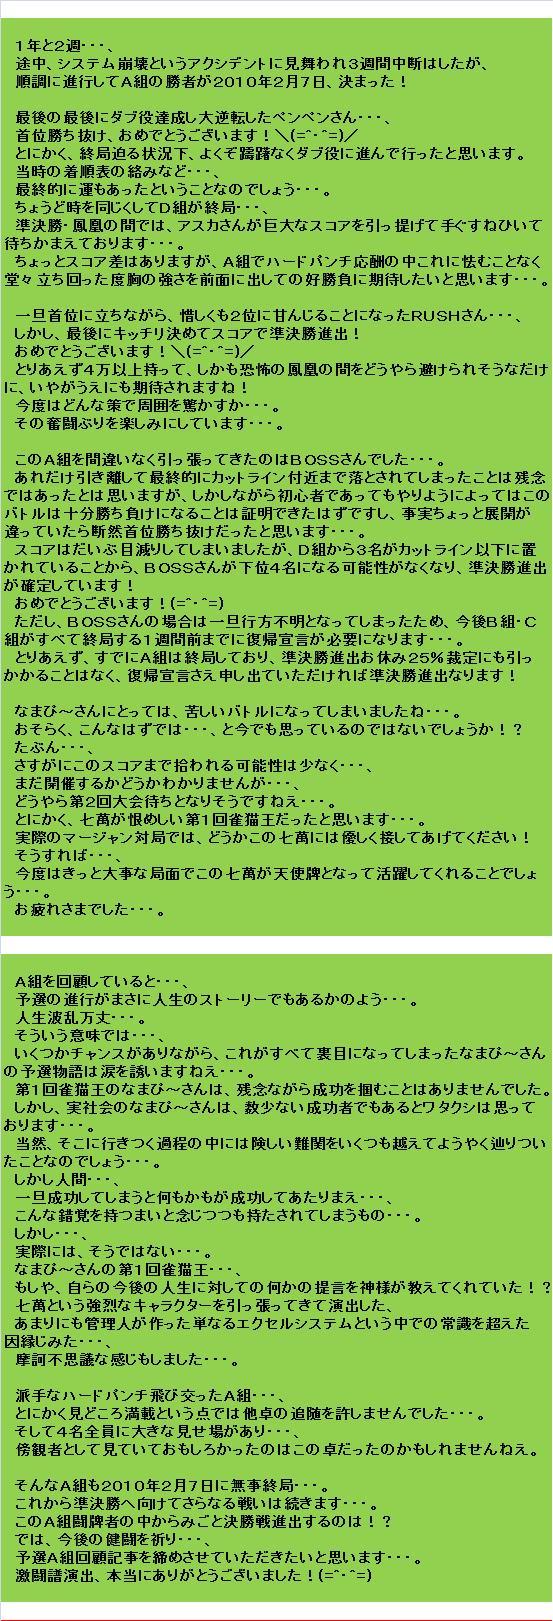 20100226・A組回顧23.jpg